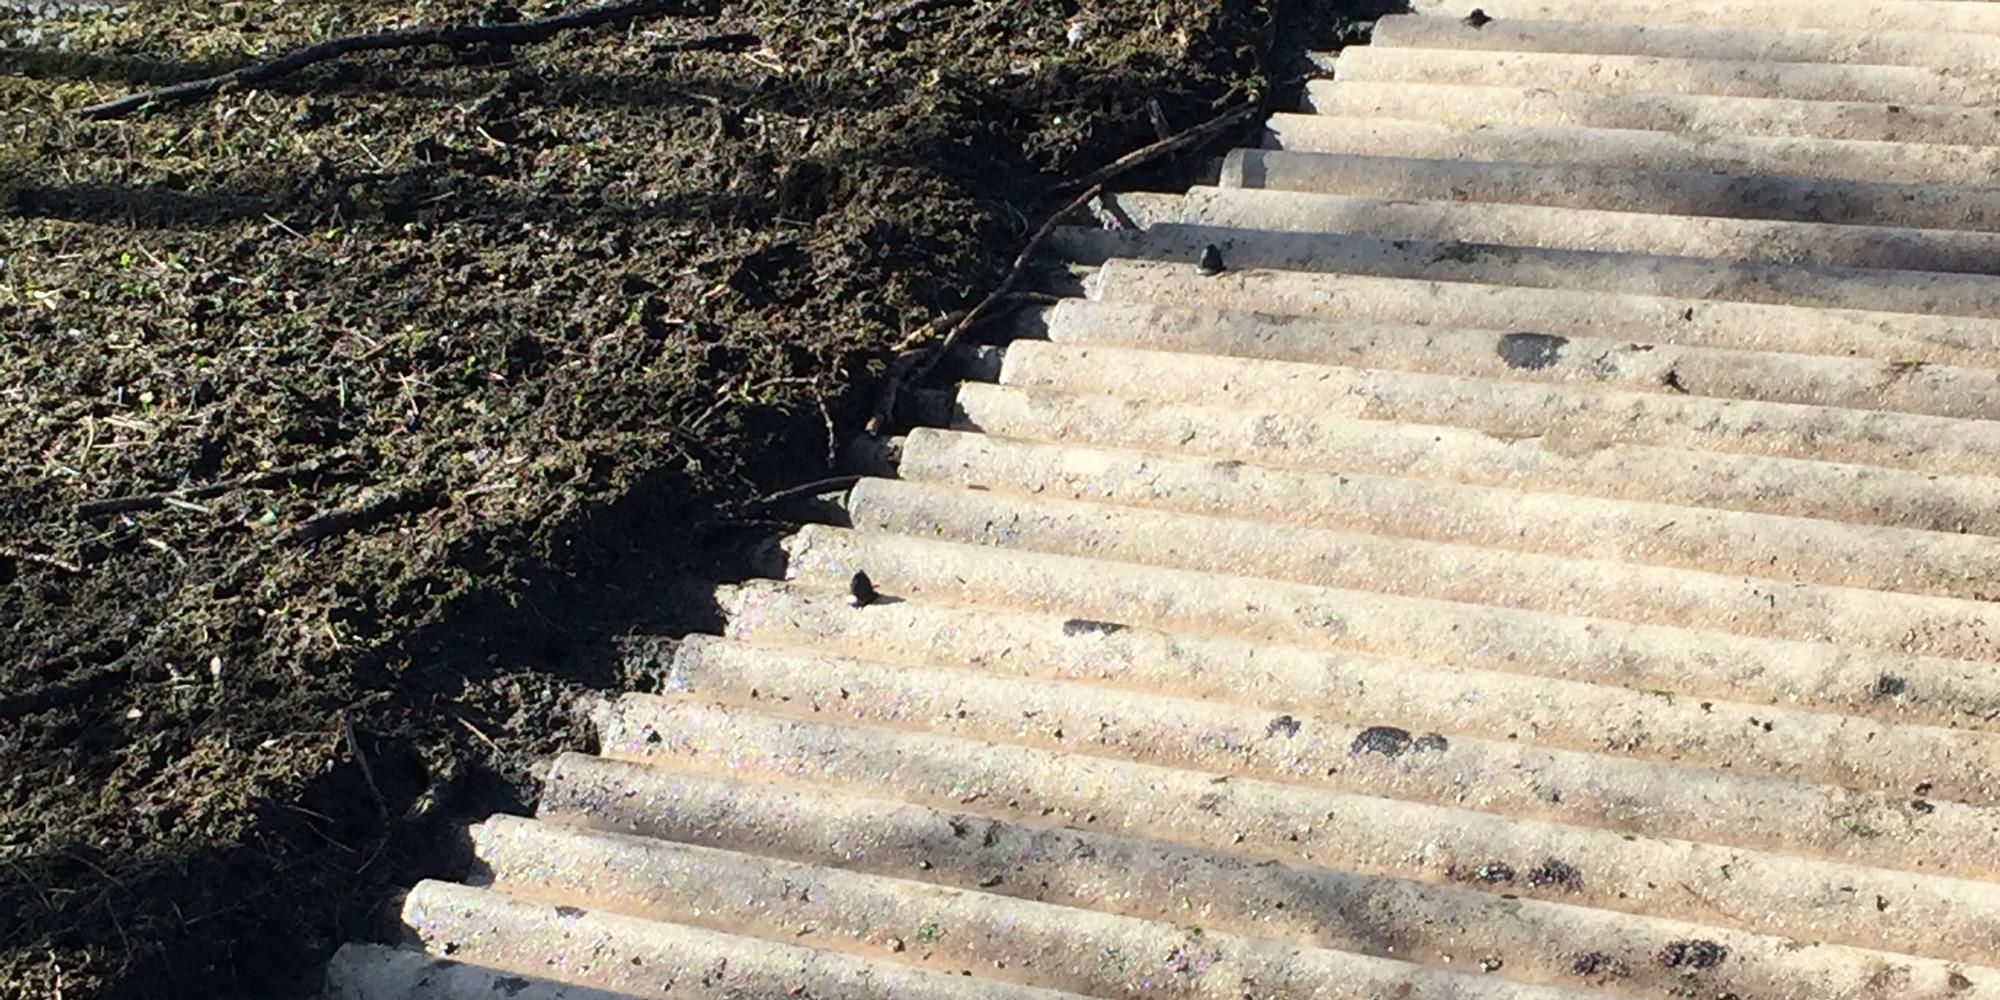 Farm-shed-roof-cleaning-service-Mayo,-Sligo,-Roscommon,-Galway-Ireland